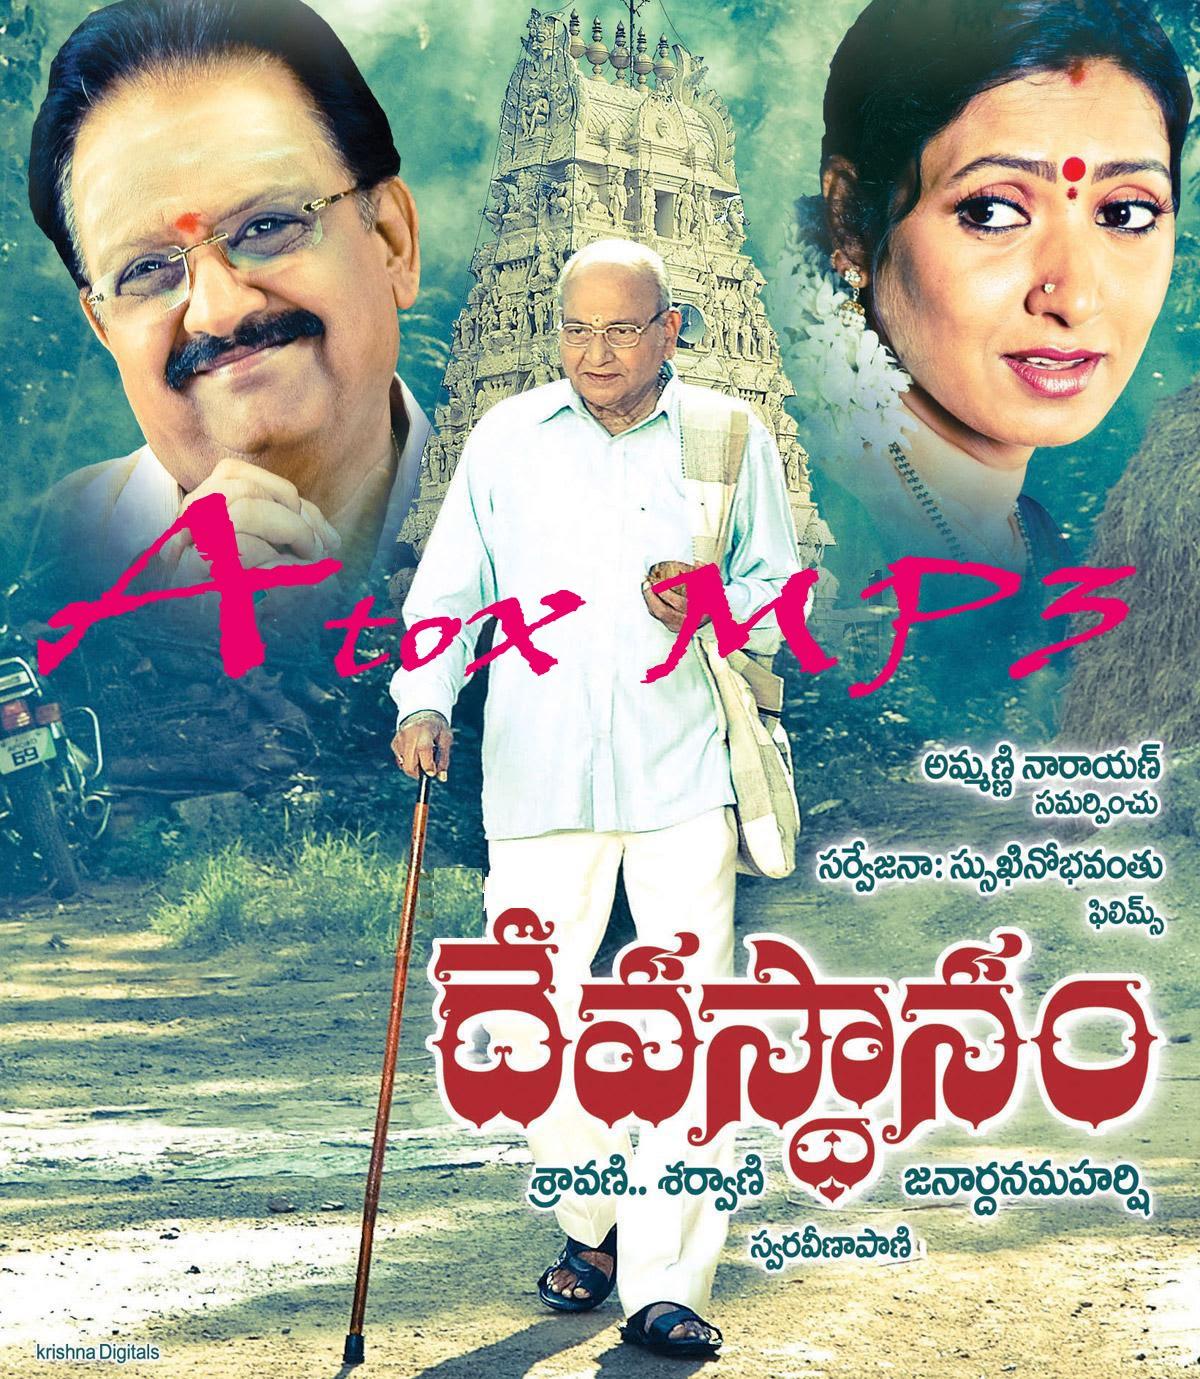 http://1.bp.blogspot.com/-vIsUhETEd7E/TvnmqR60kyI/AAAAAAAAAxw/G-oyw1_qXWc/s1600/devastanam_telugu_movie_wallpapers_001%2Bcopy.jpg